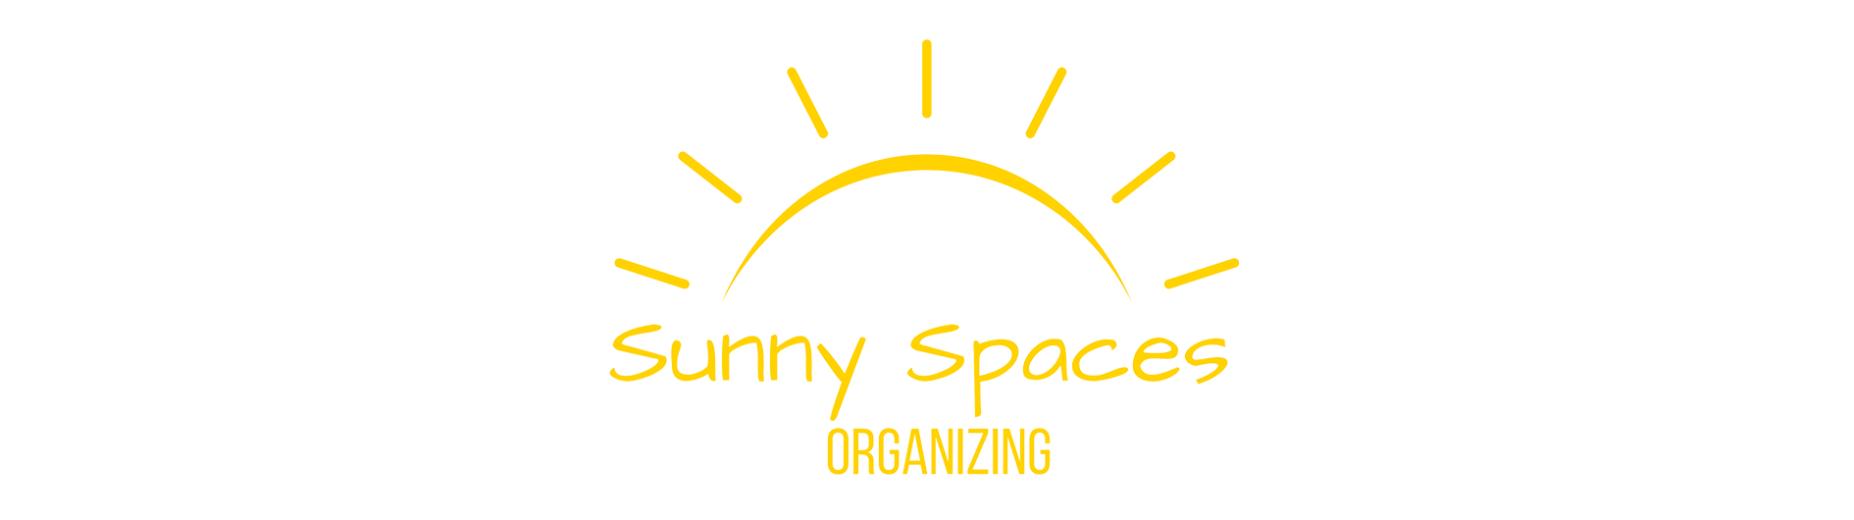 Sunny Spaces Organizing